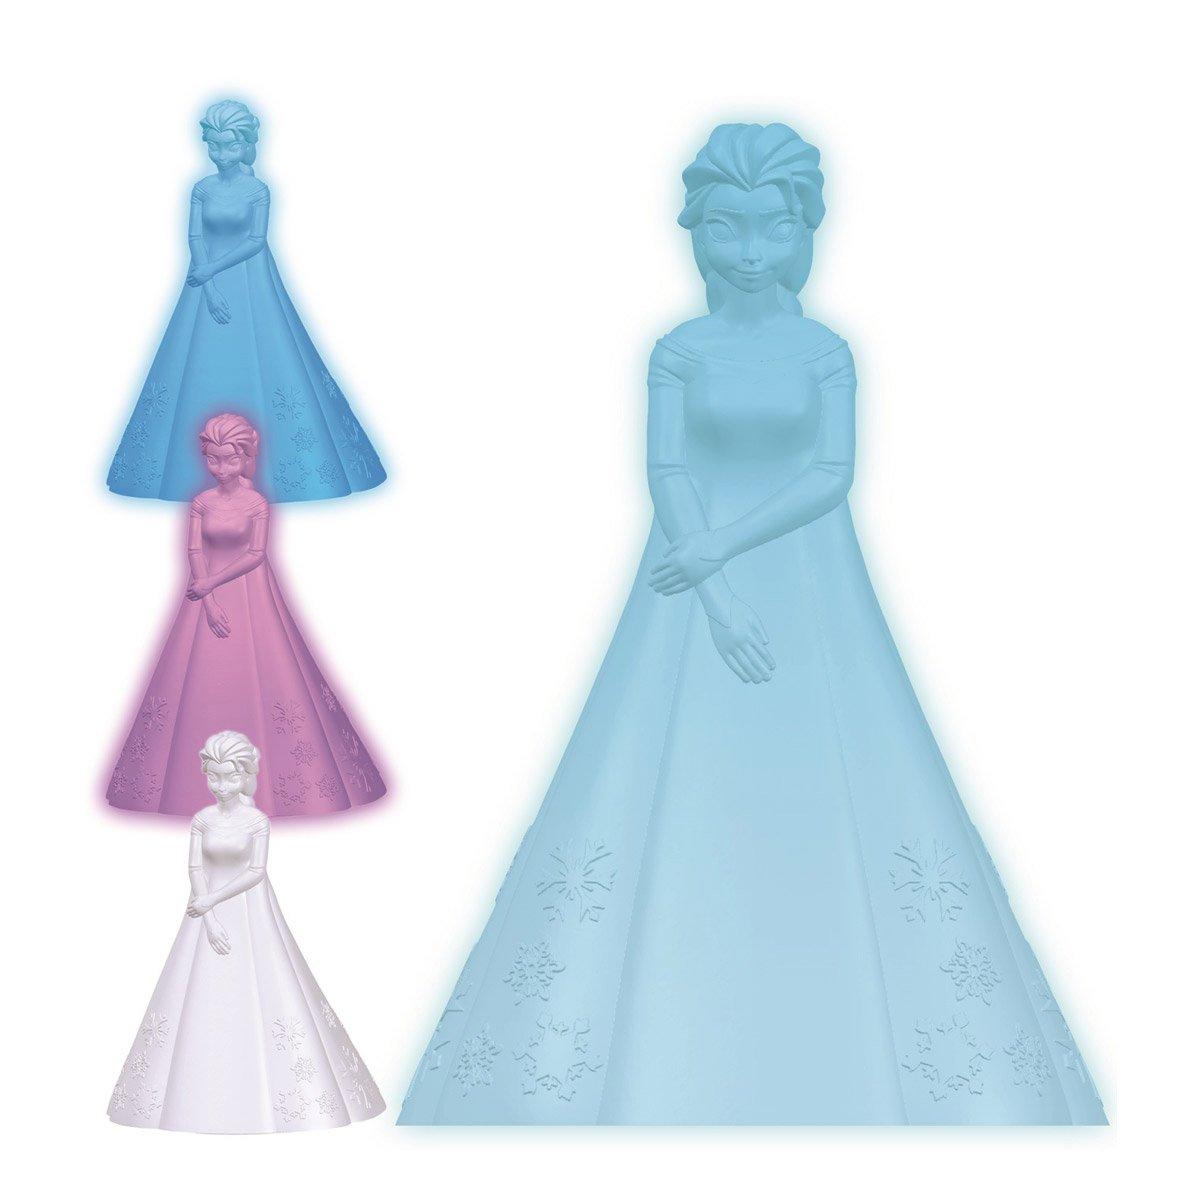 Lexibook - 3D design Frozen Elsa colour change night light approx. 20cm (NLJ110FZ)